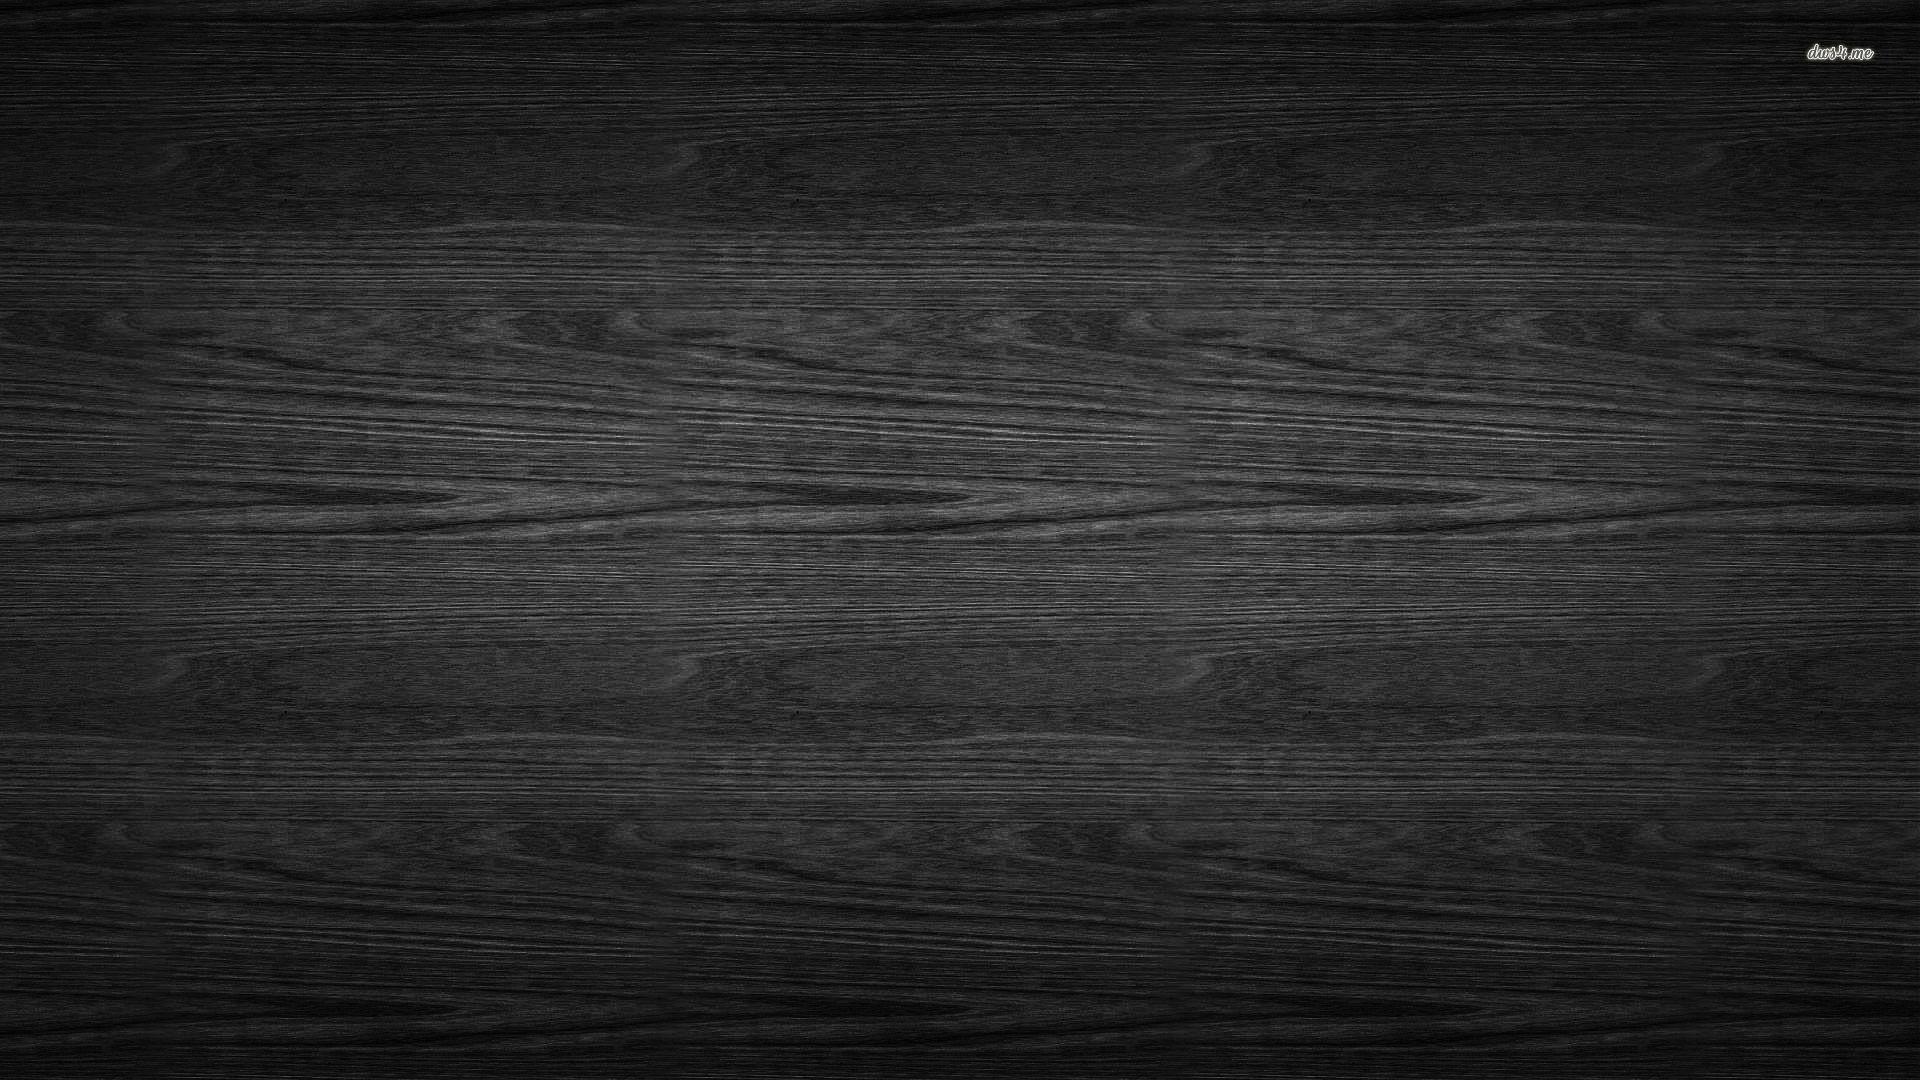 Pin By Albertoesteban On Surface Textures Wallpaper Black Wood Wood